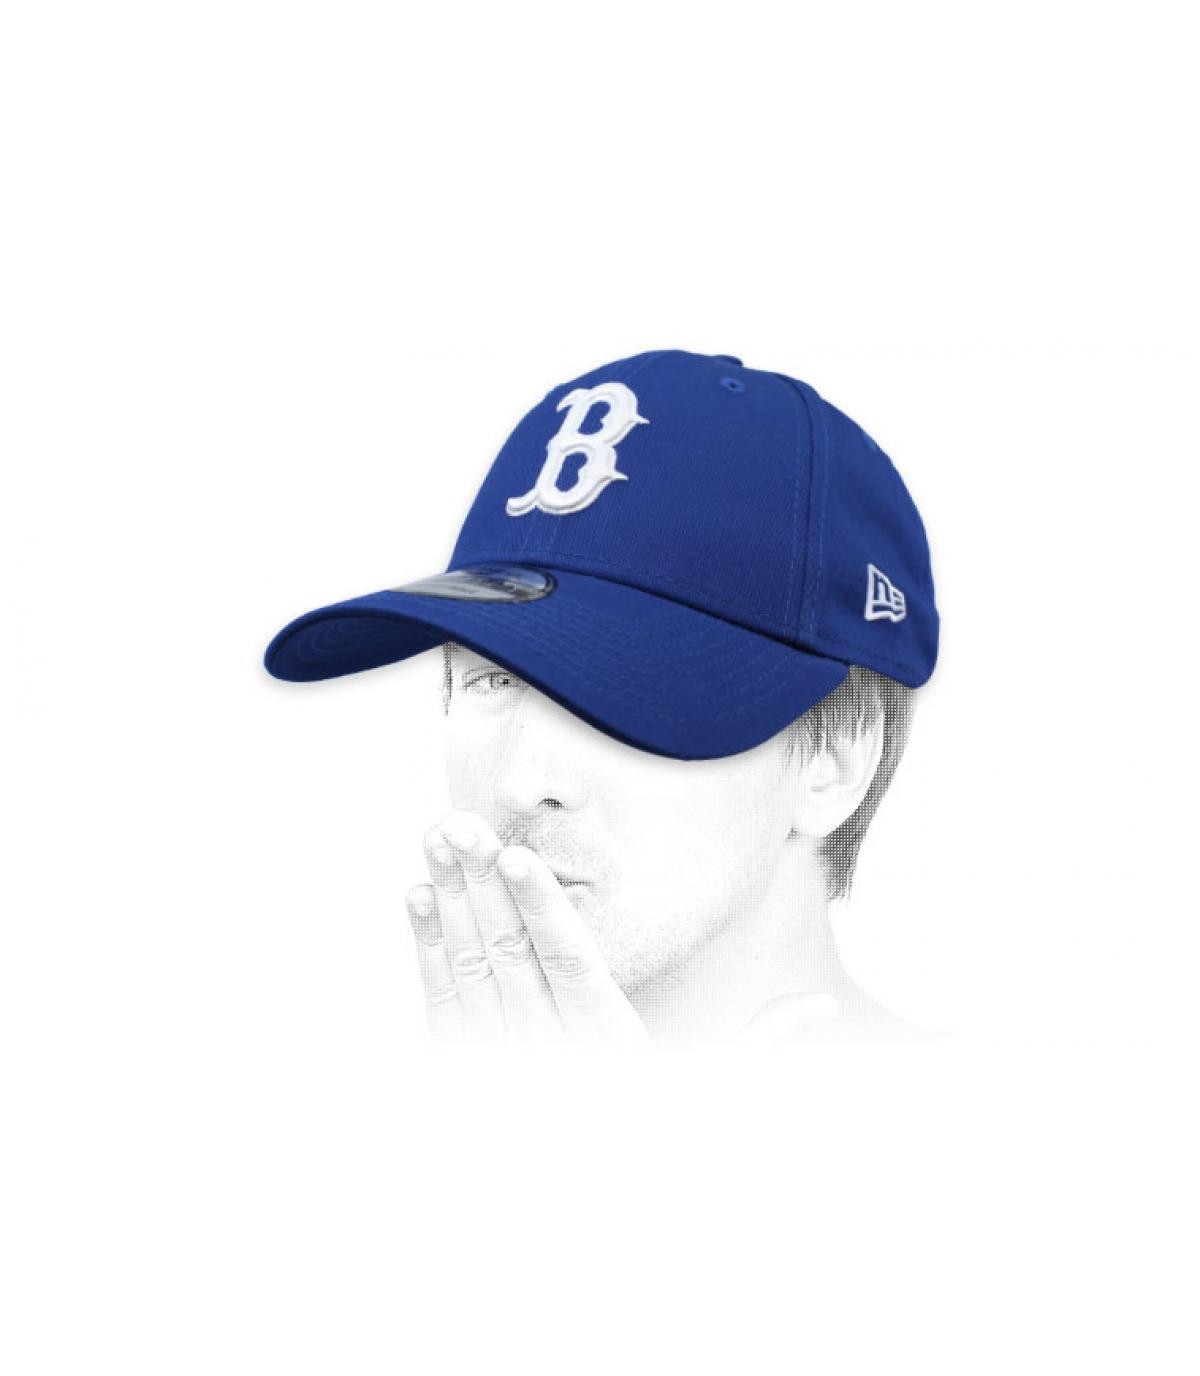 Cap B blau